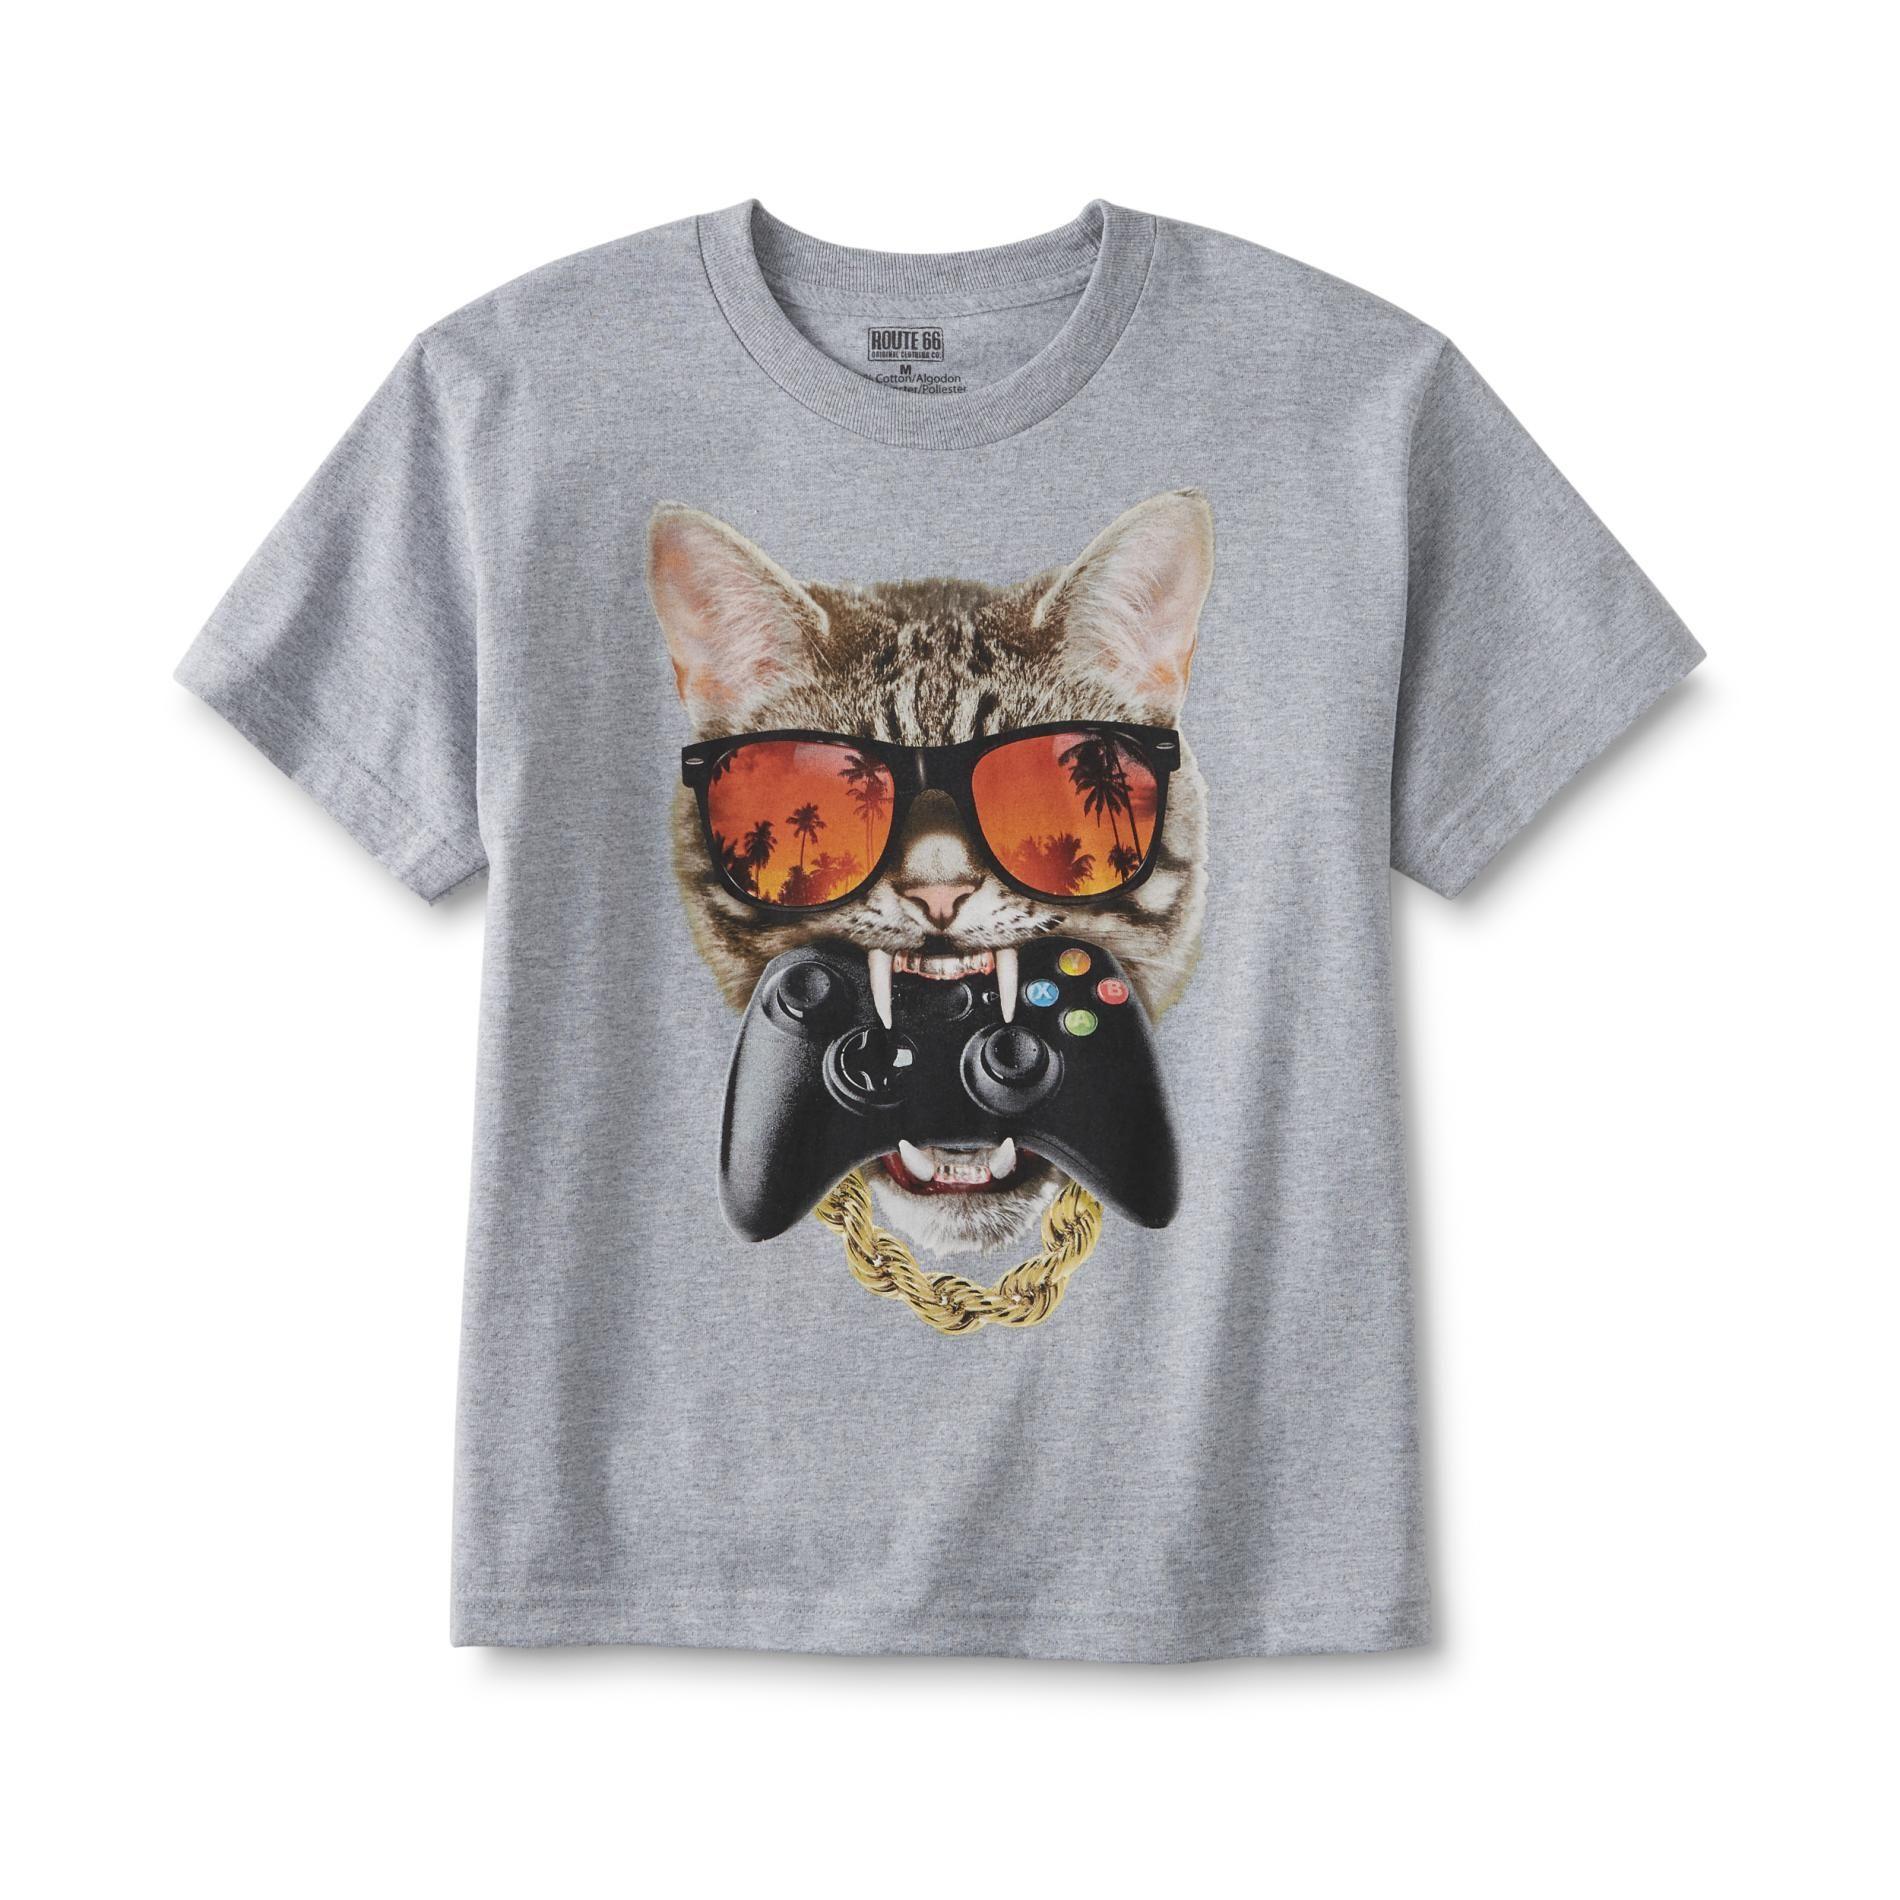 Cat eating an Xbox controller tee Mens tops, Shirts tops